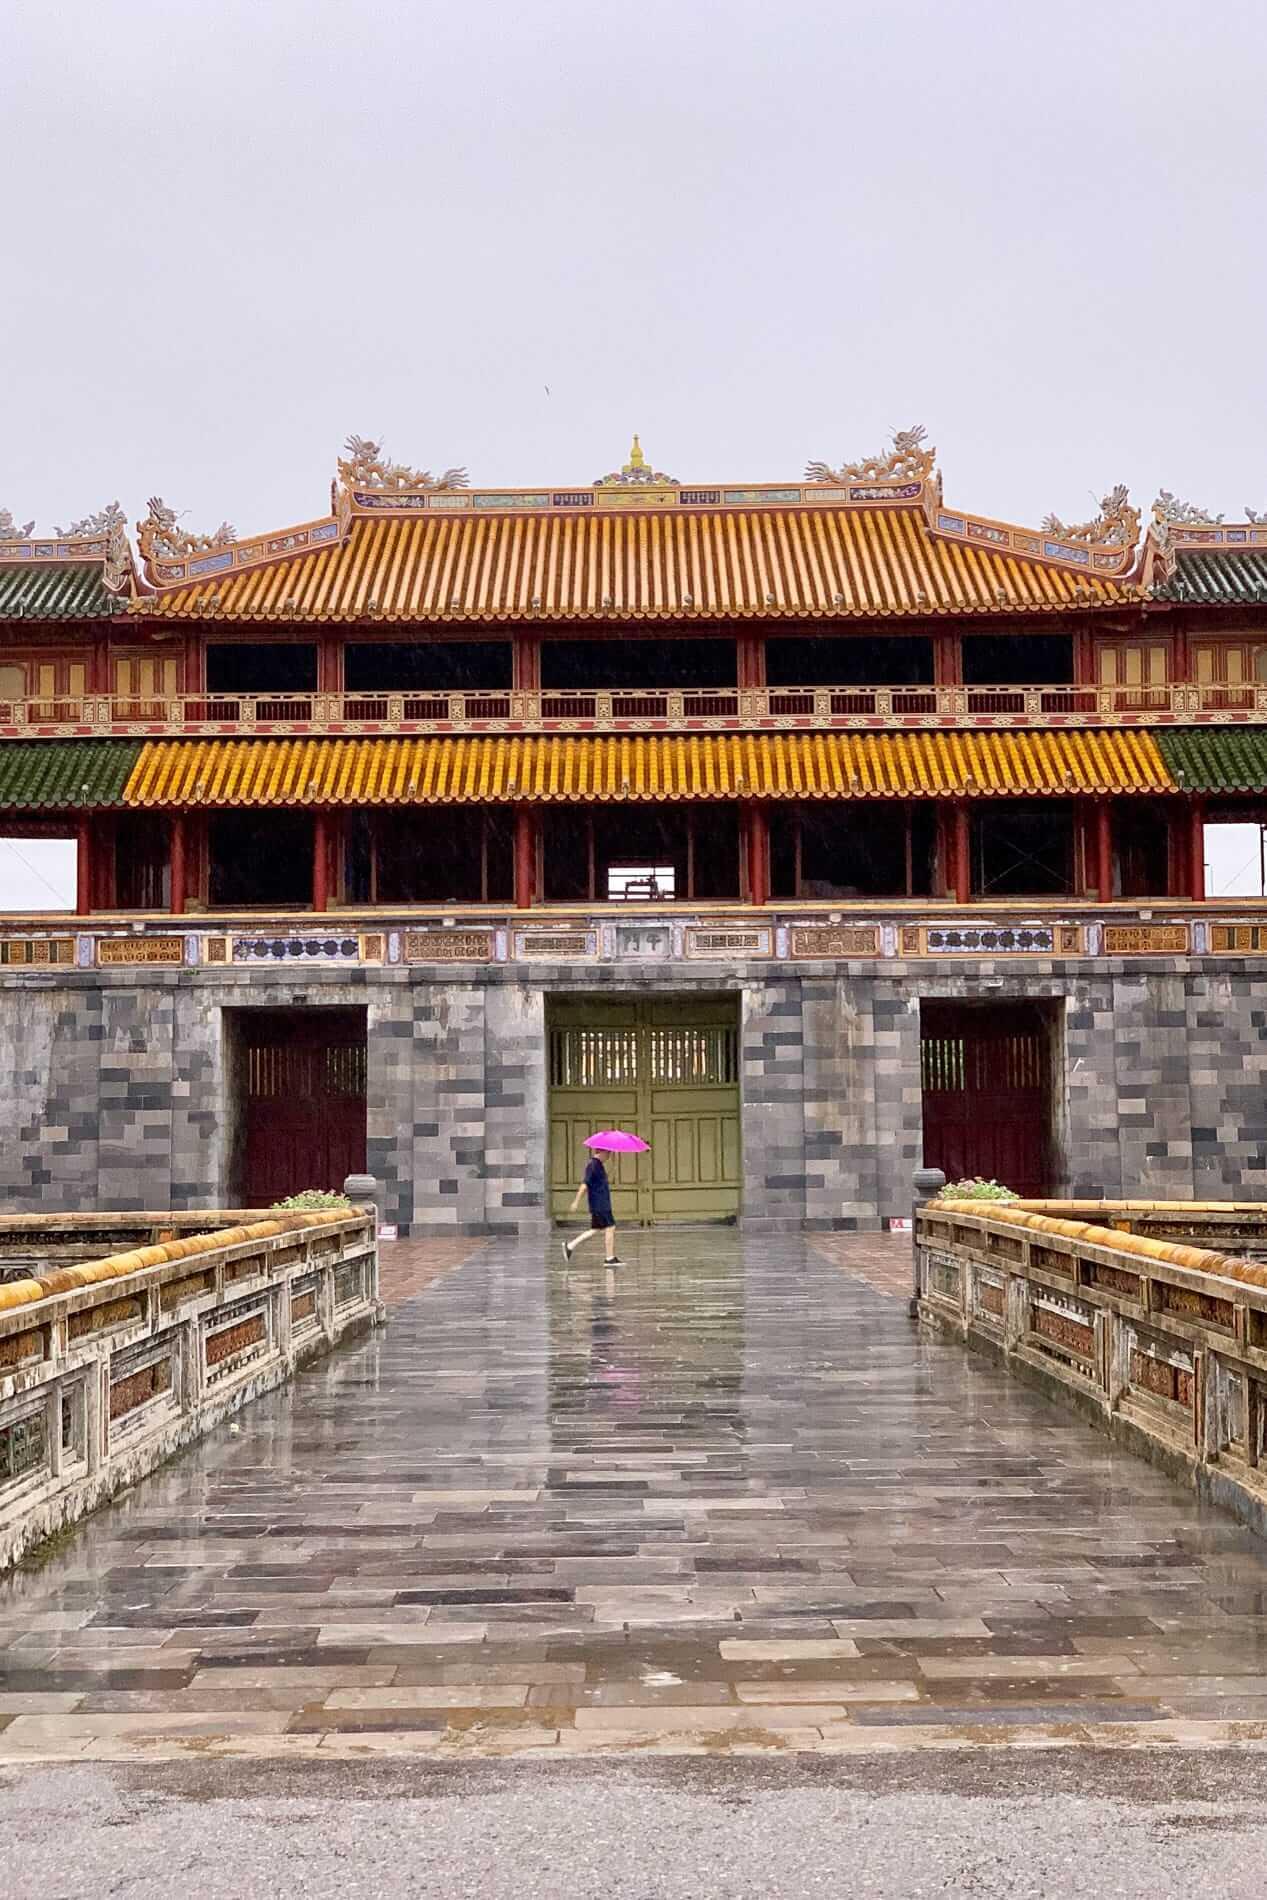 A rainy day at the Hue Citadel